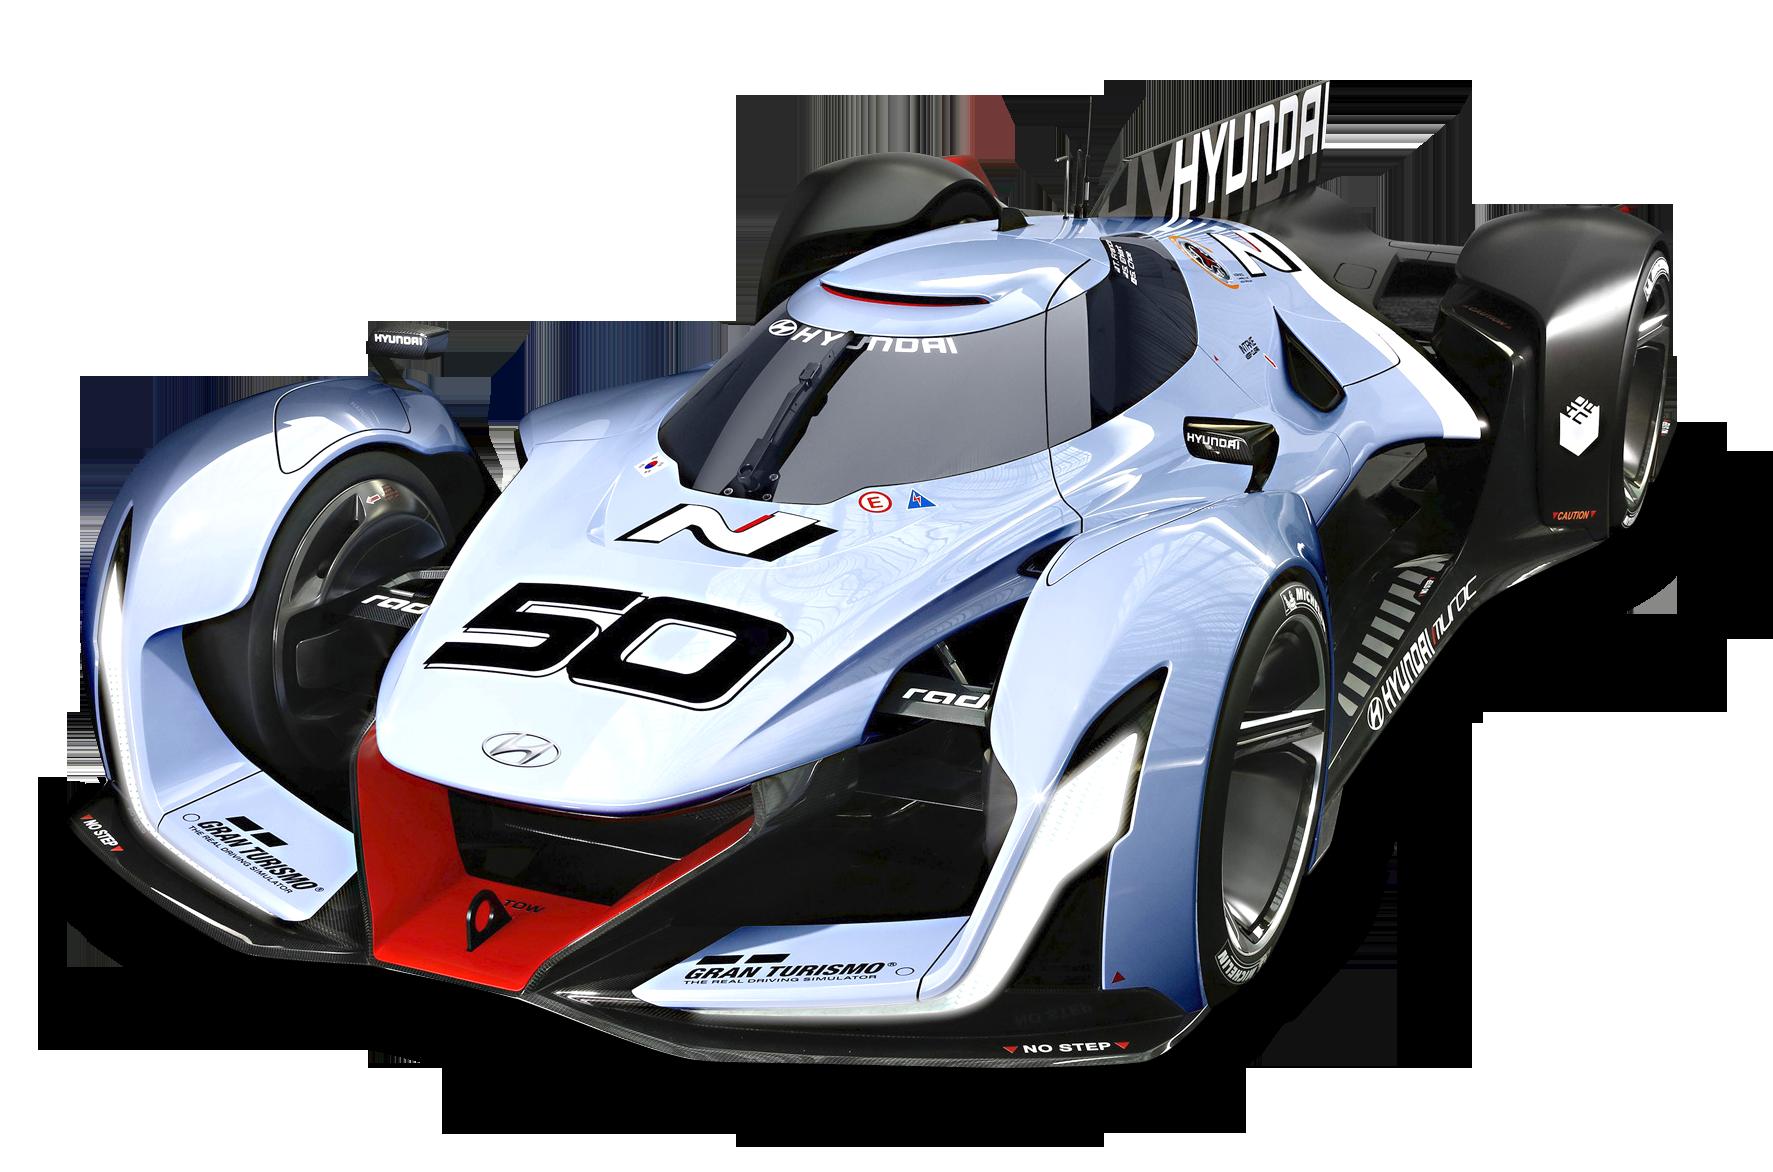 Hyundai N 2025 Vision Racing Car Png Image Hyundai Race Cars Car